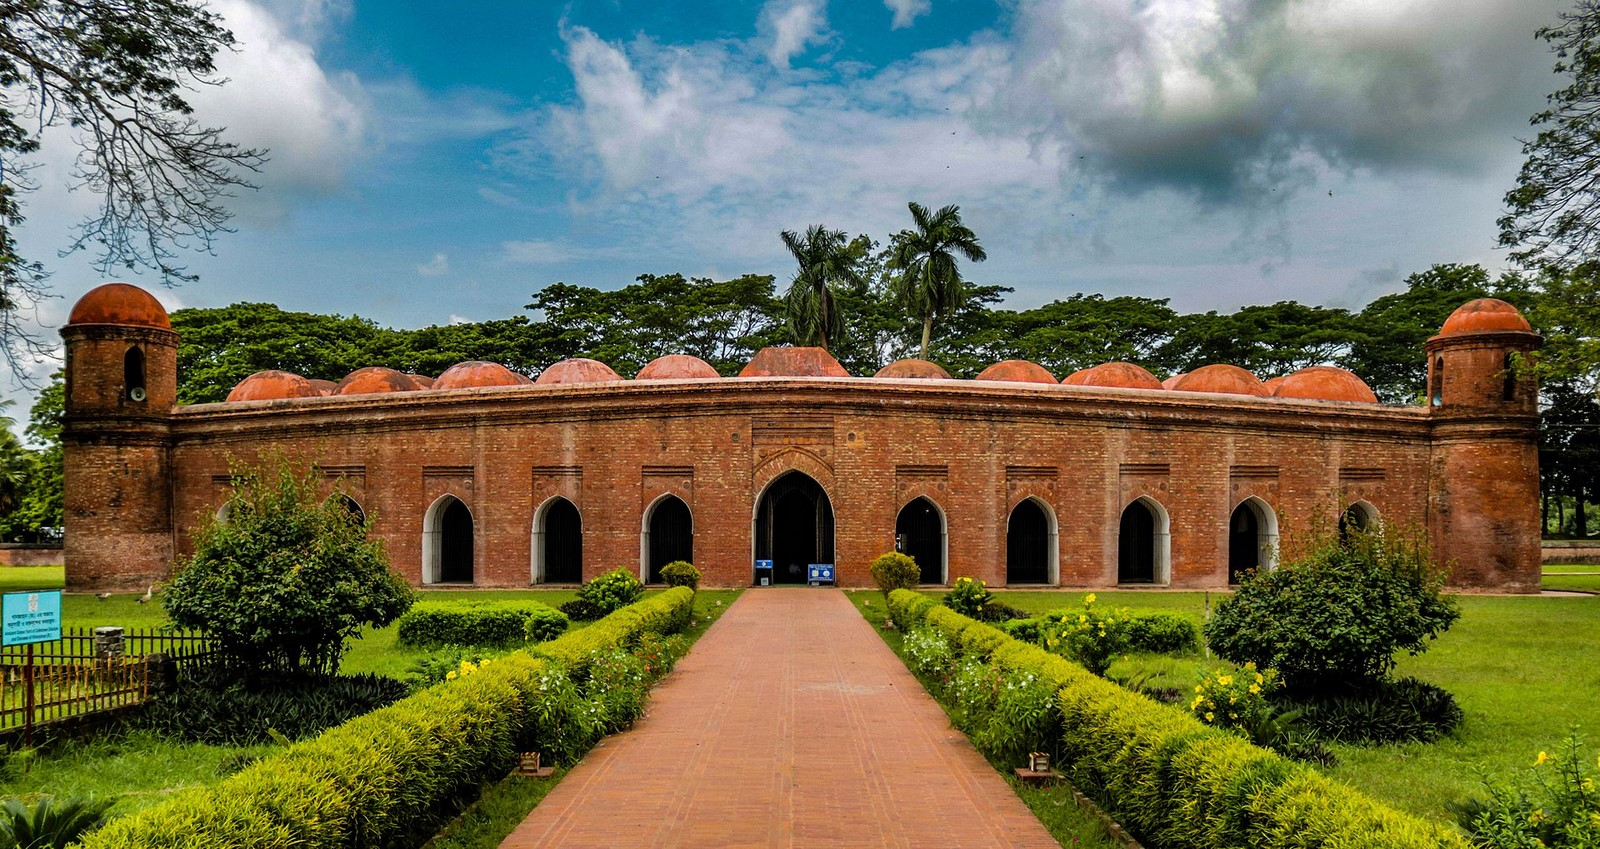 Heritage Mosques in Bangladesh - Sheet5